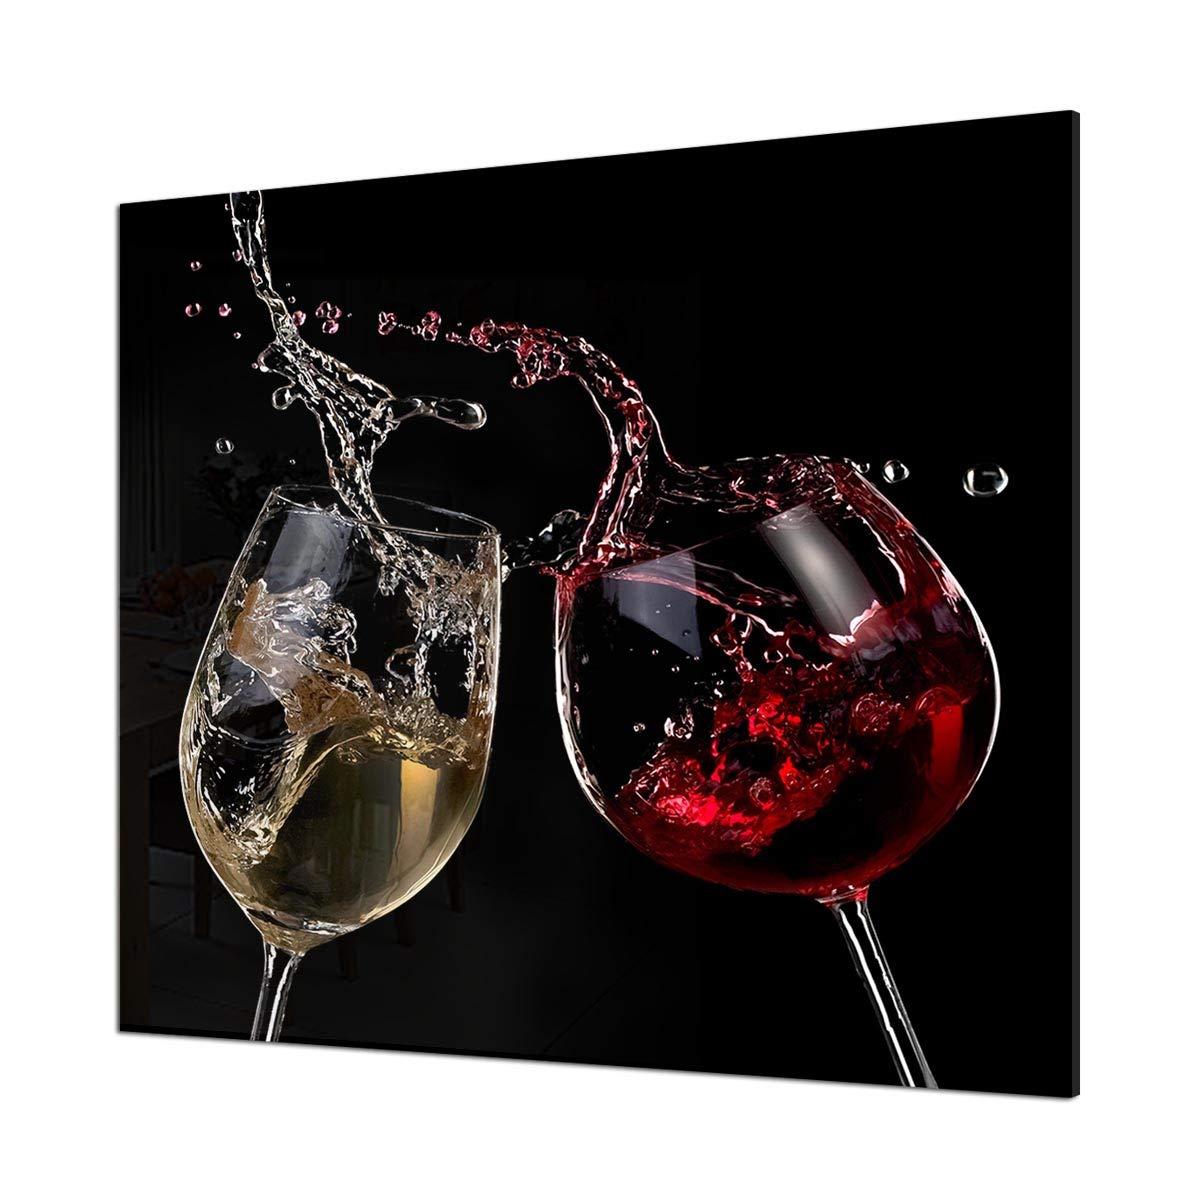 Printed Kitchen Glass Splashback Heat Resistant Toughened Glass Red /& White Wine on Black Design 40 x 60cm - Mirror Screw Fixing